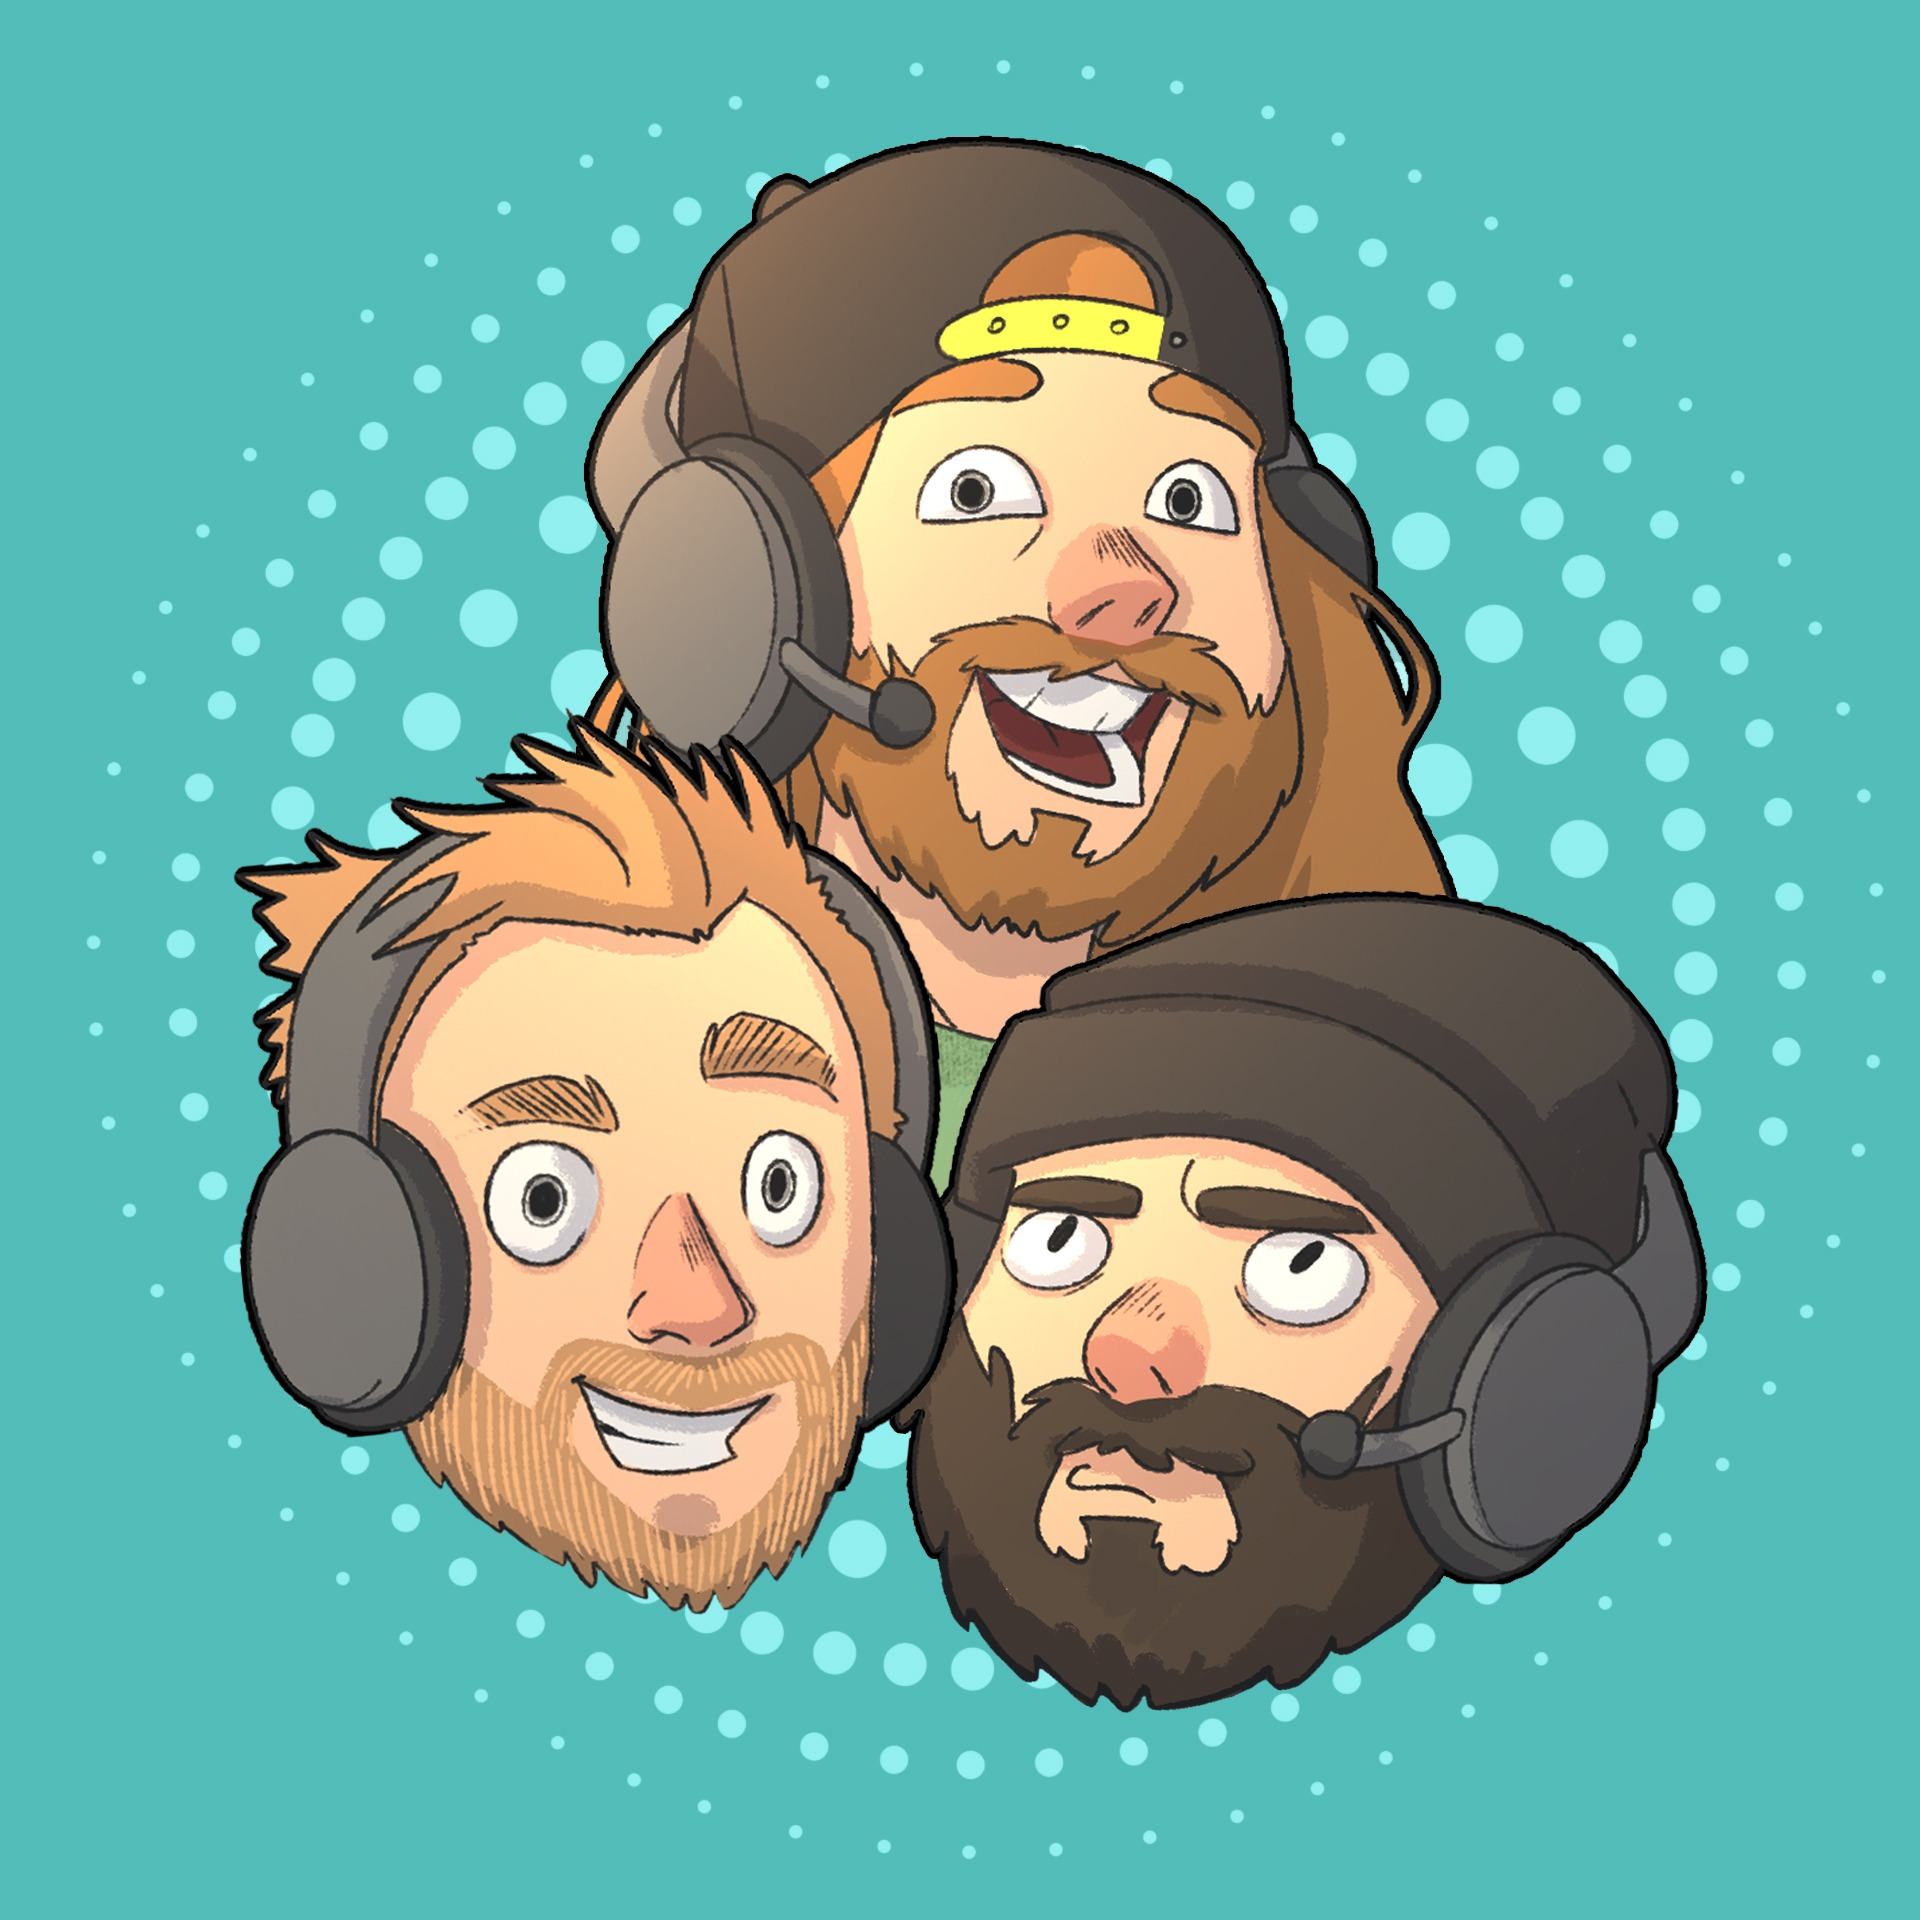 @PodManiaPodcasts Profile Image | Linktree